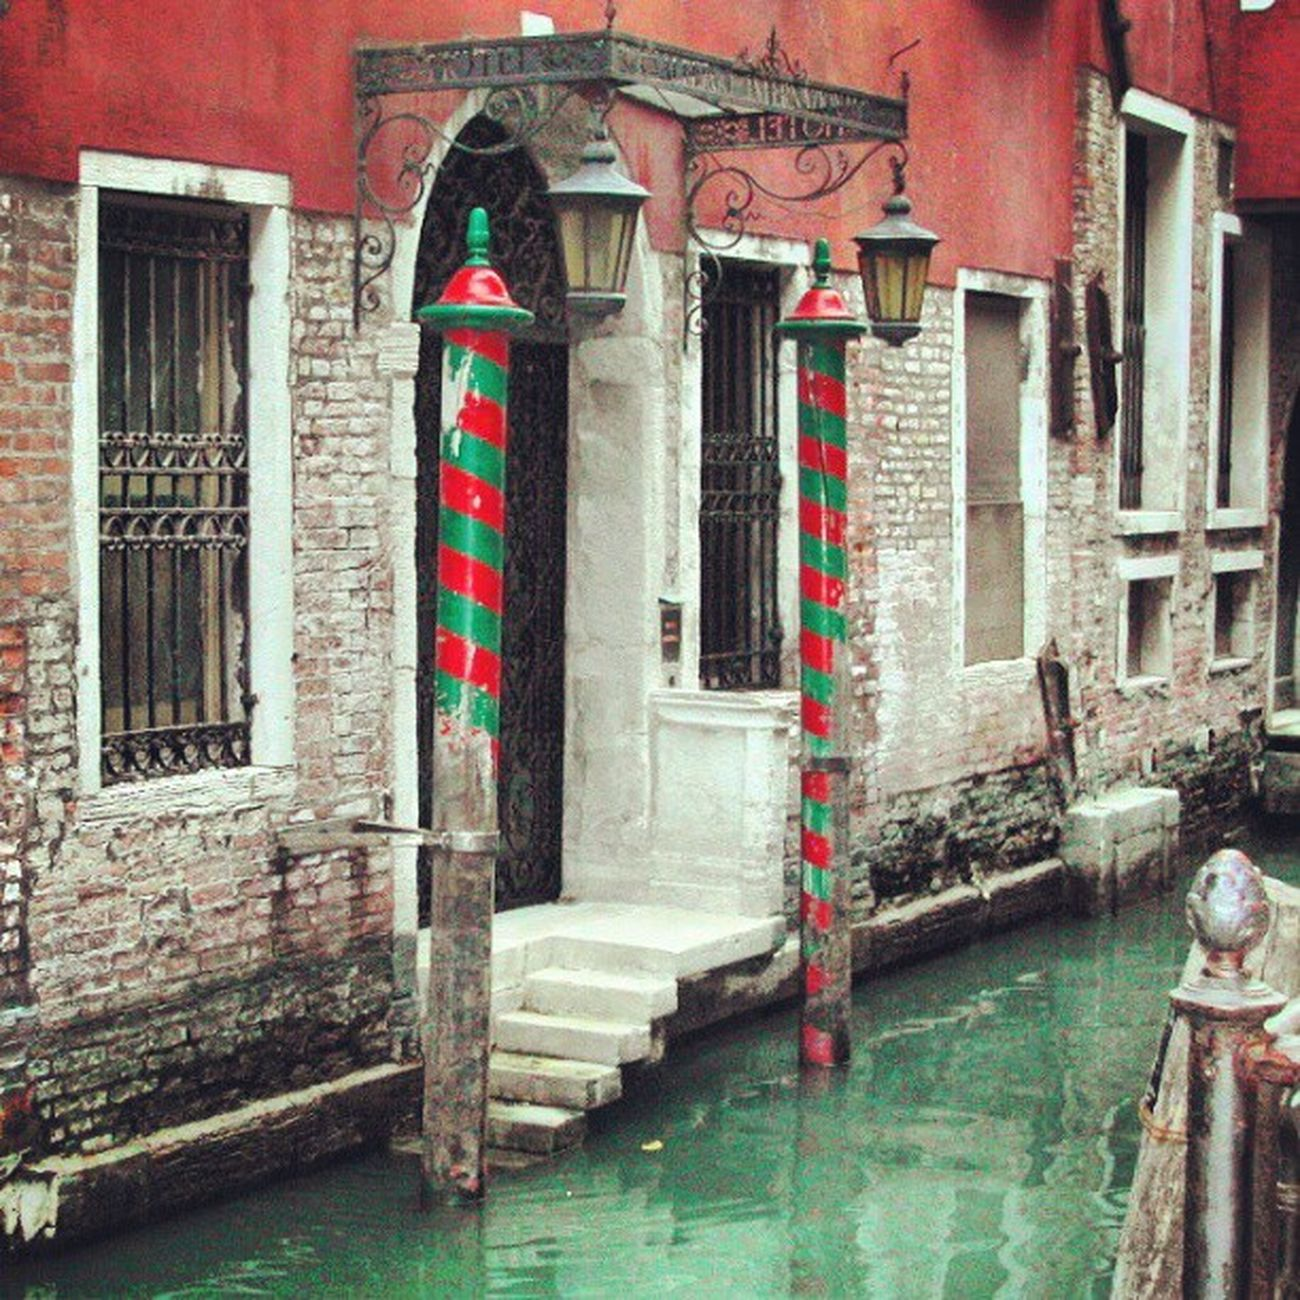 #venice #door #water #igers #igfamos #instagood Water Door Venice Igers Instagood Igfamos